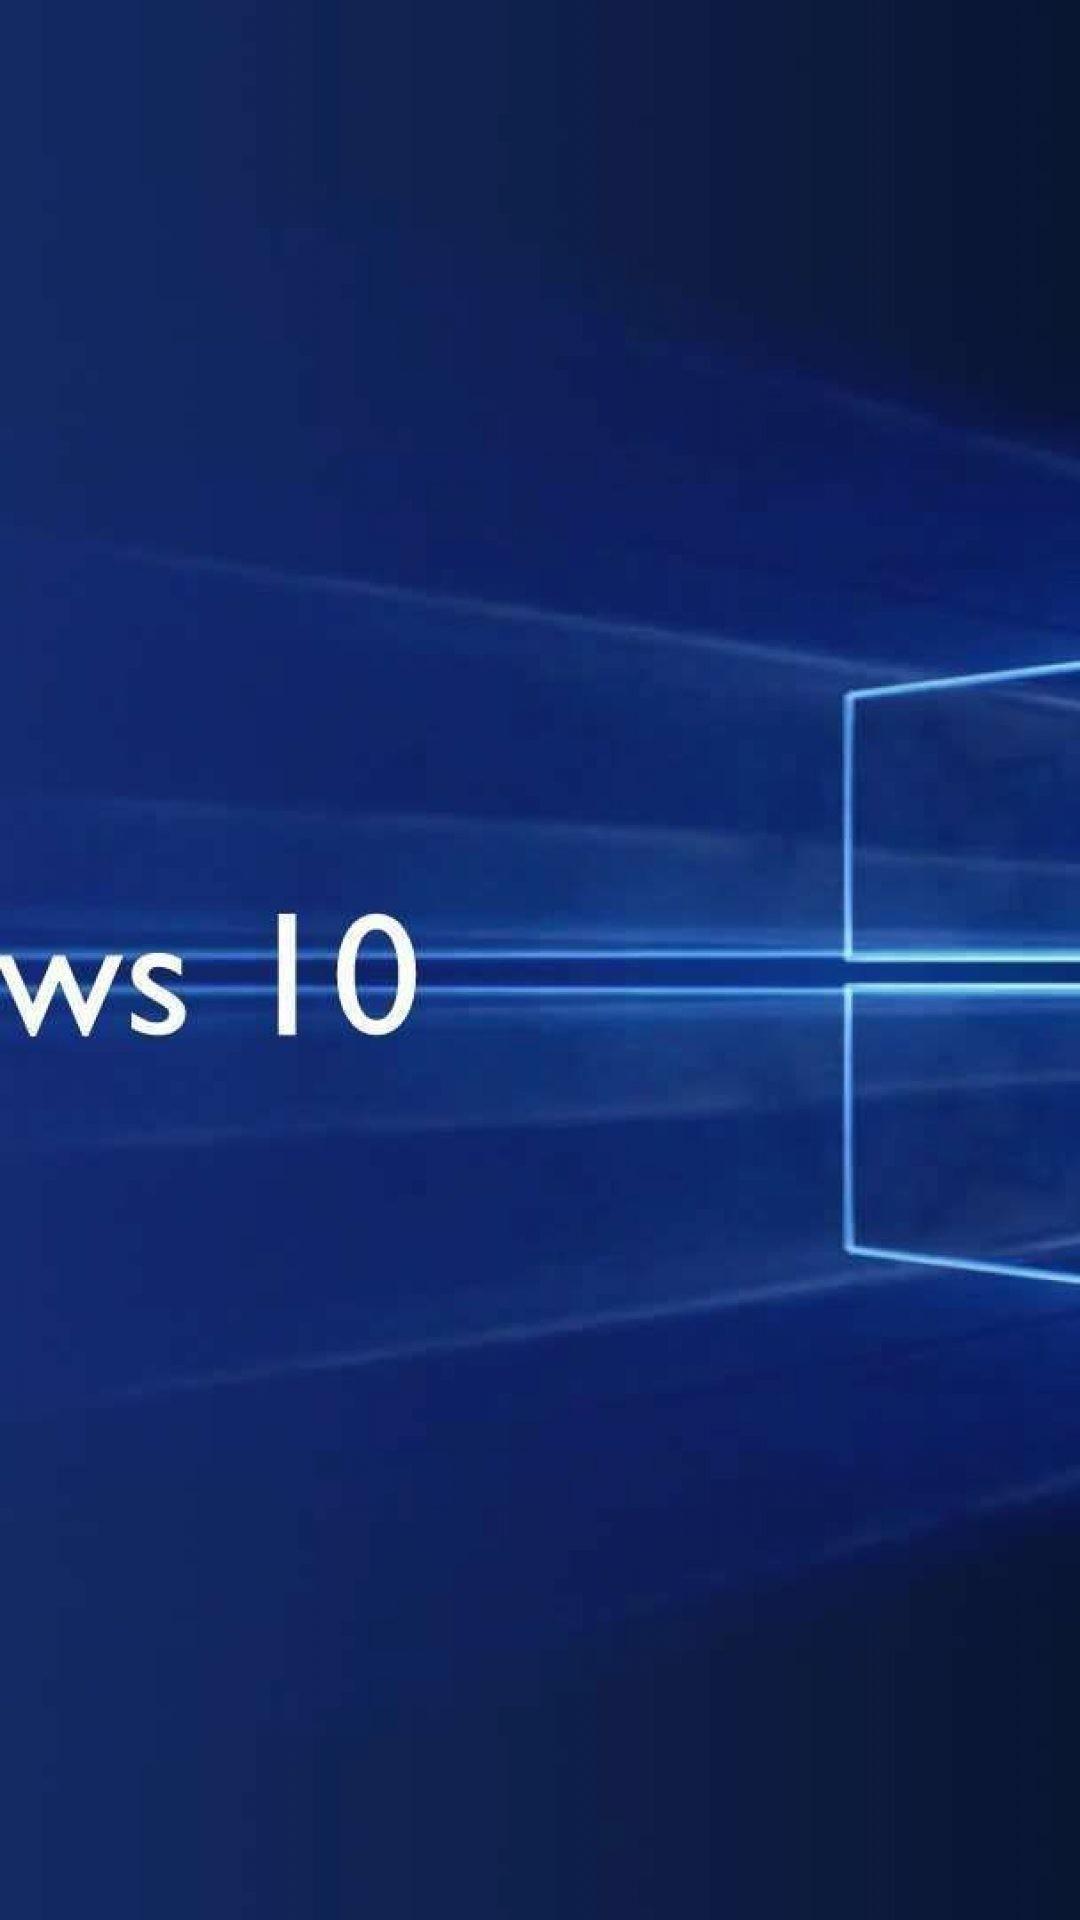 windows 10 hd wallpaper for desktop